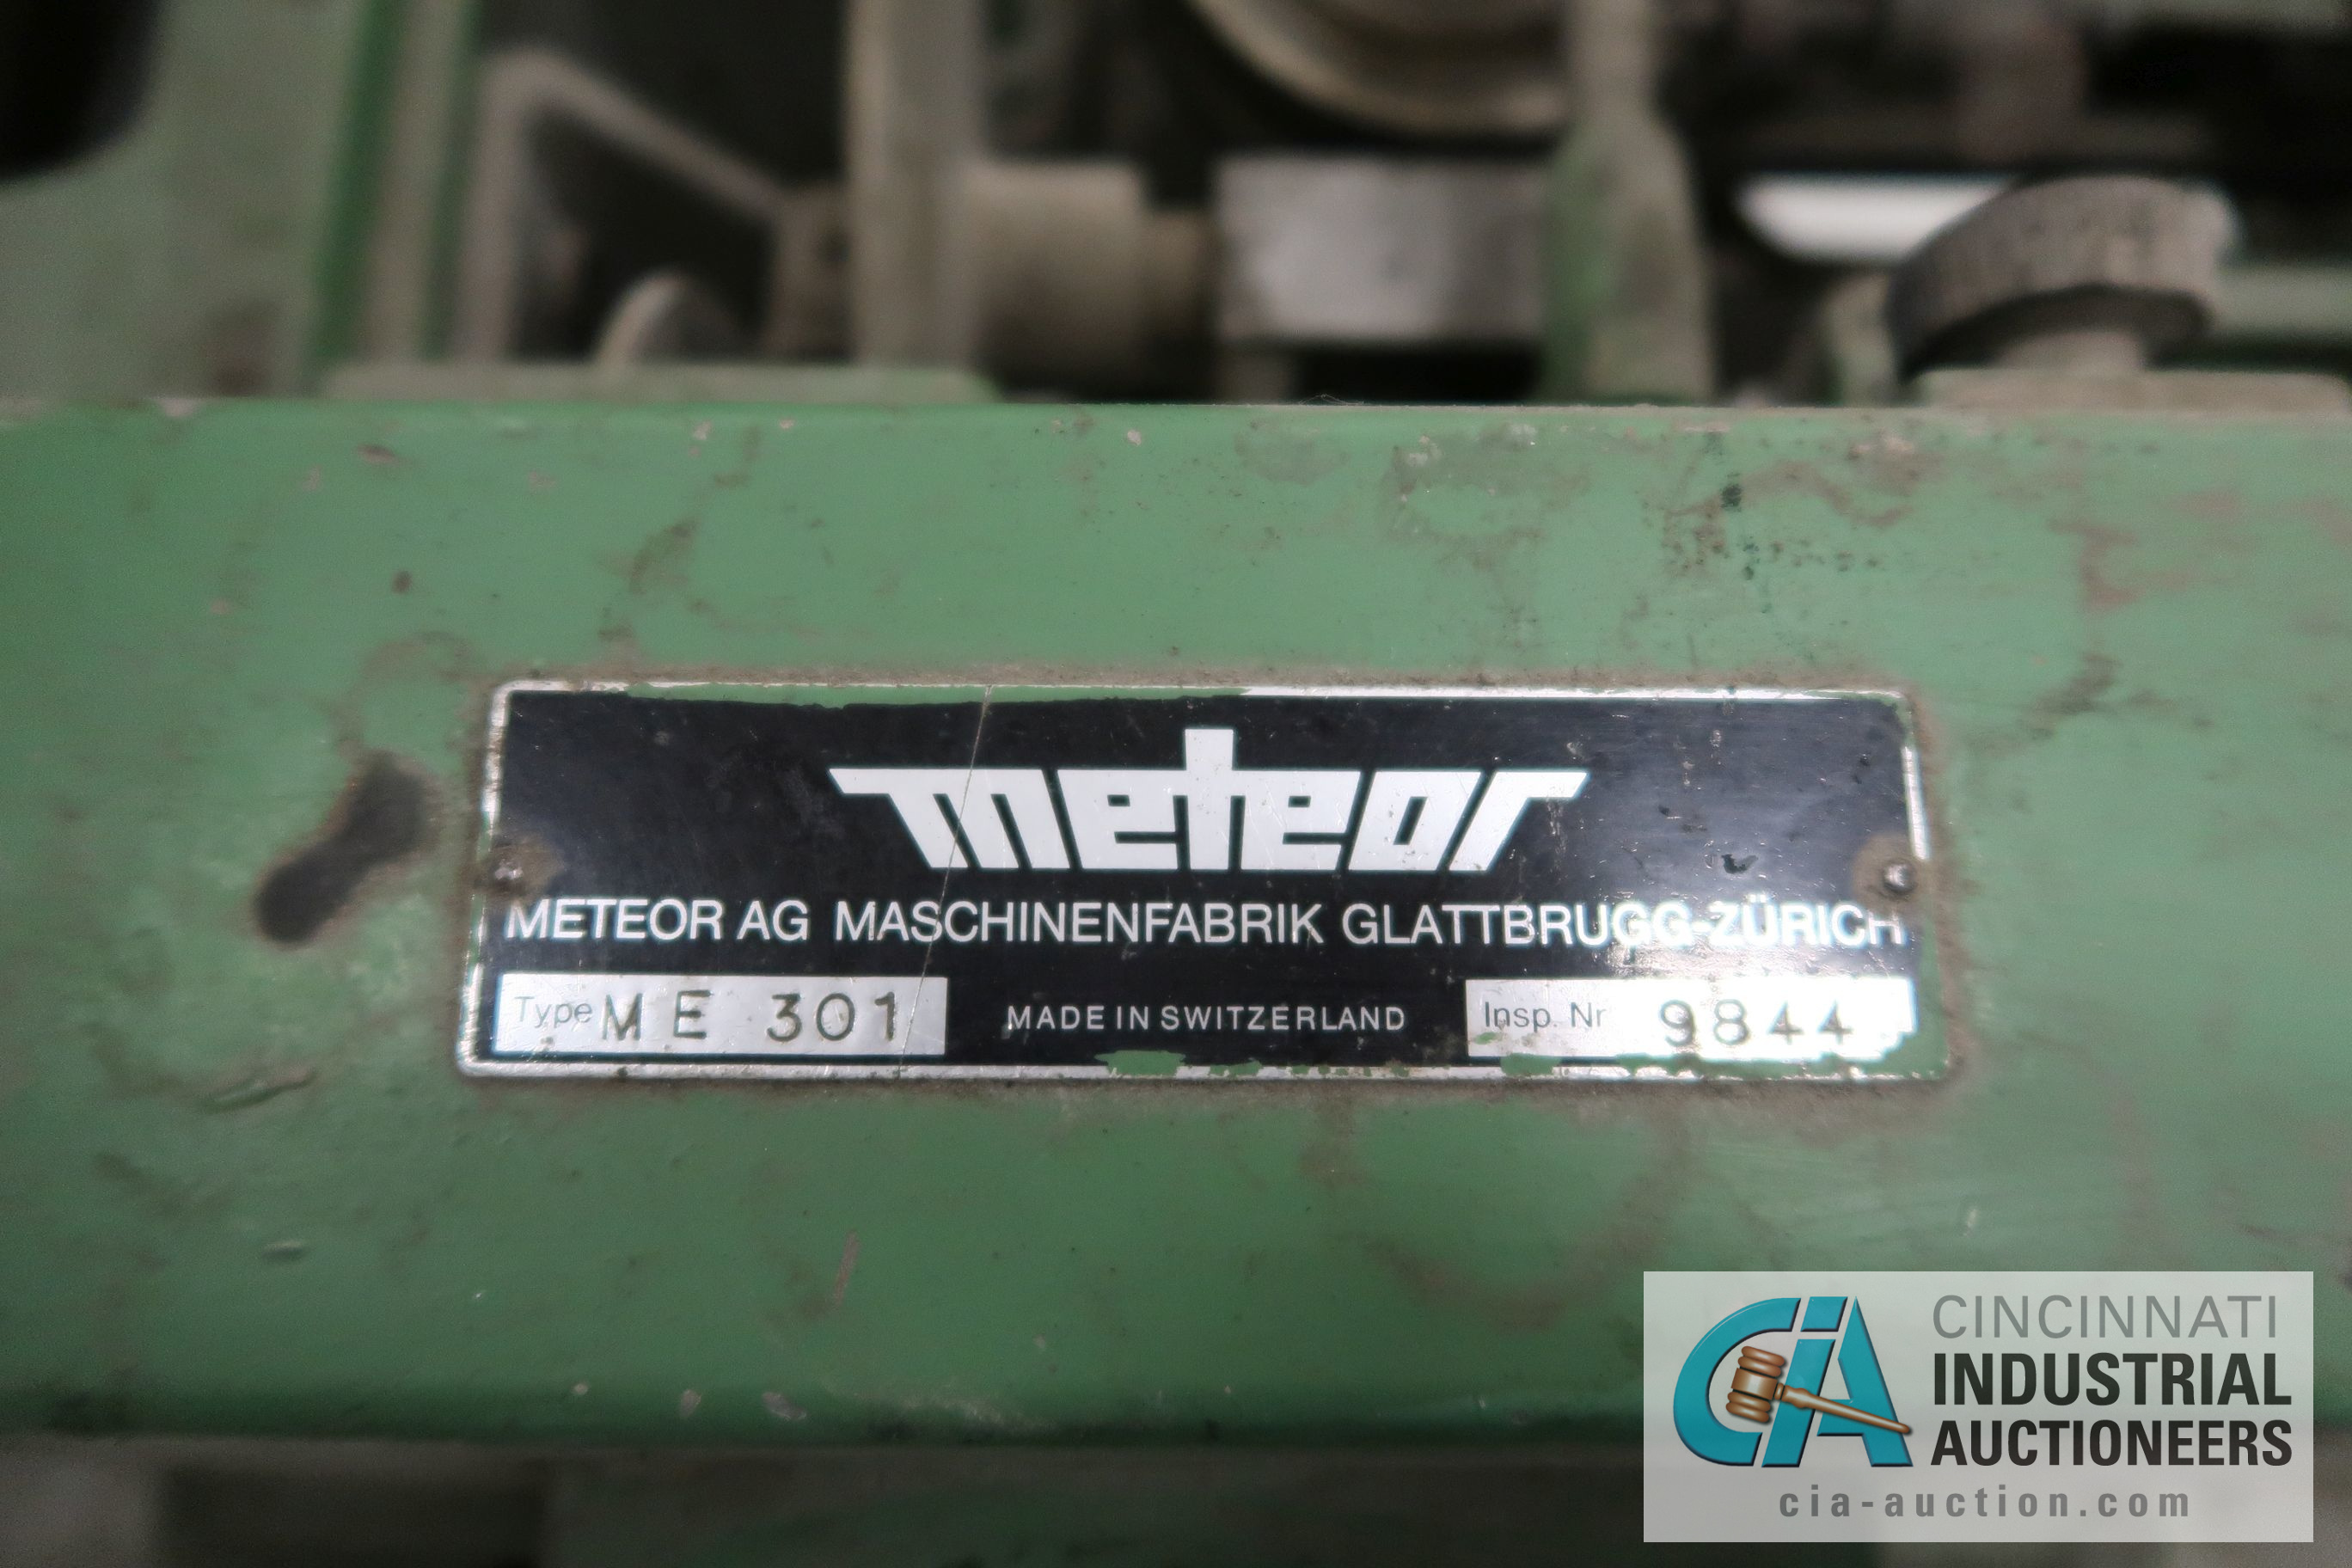 METEOR TYPE ME 301 BOBBIN WINDING MACHINE; S/N 9844 - Image 3 of 5